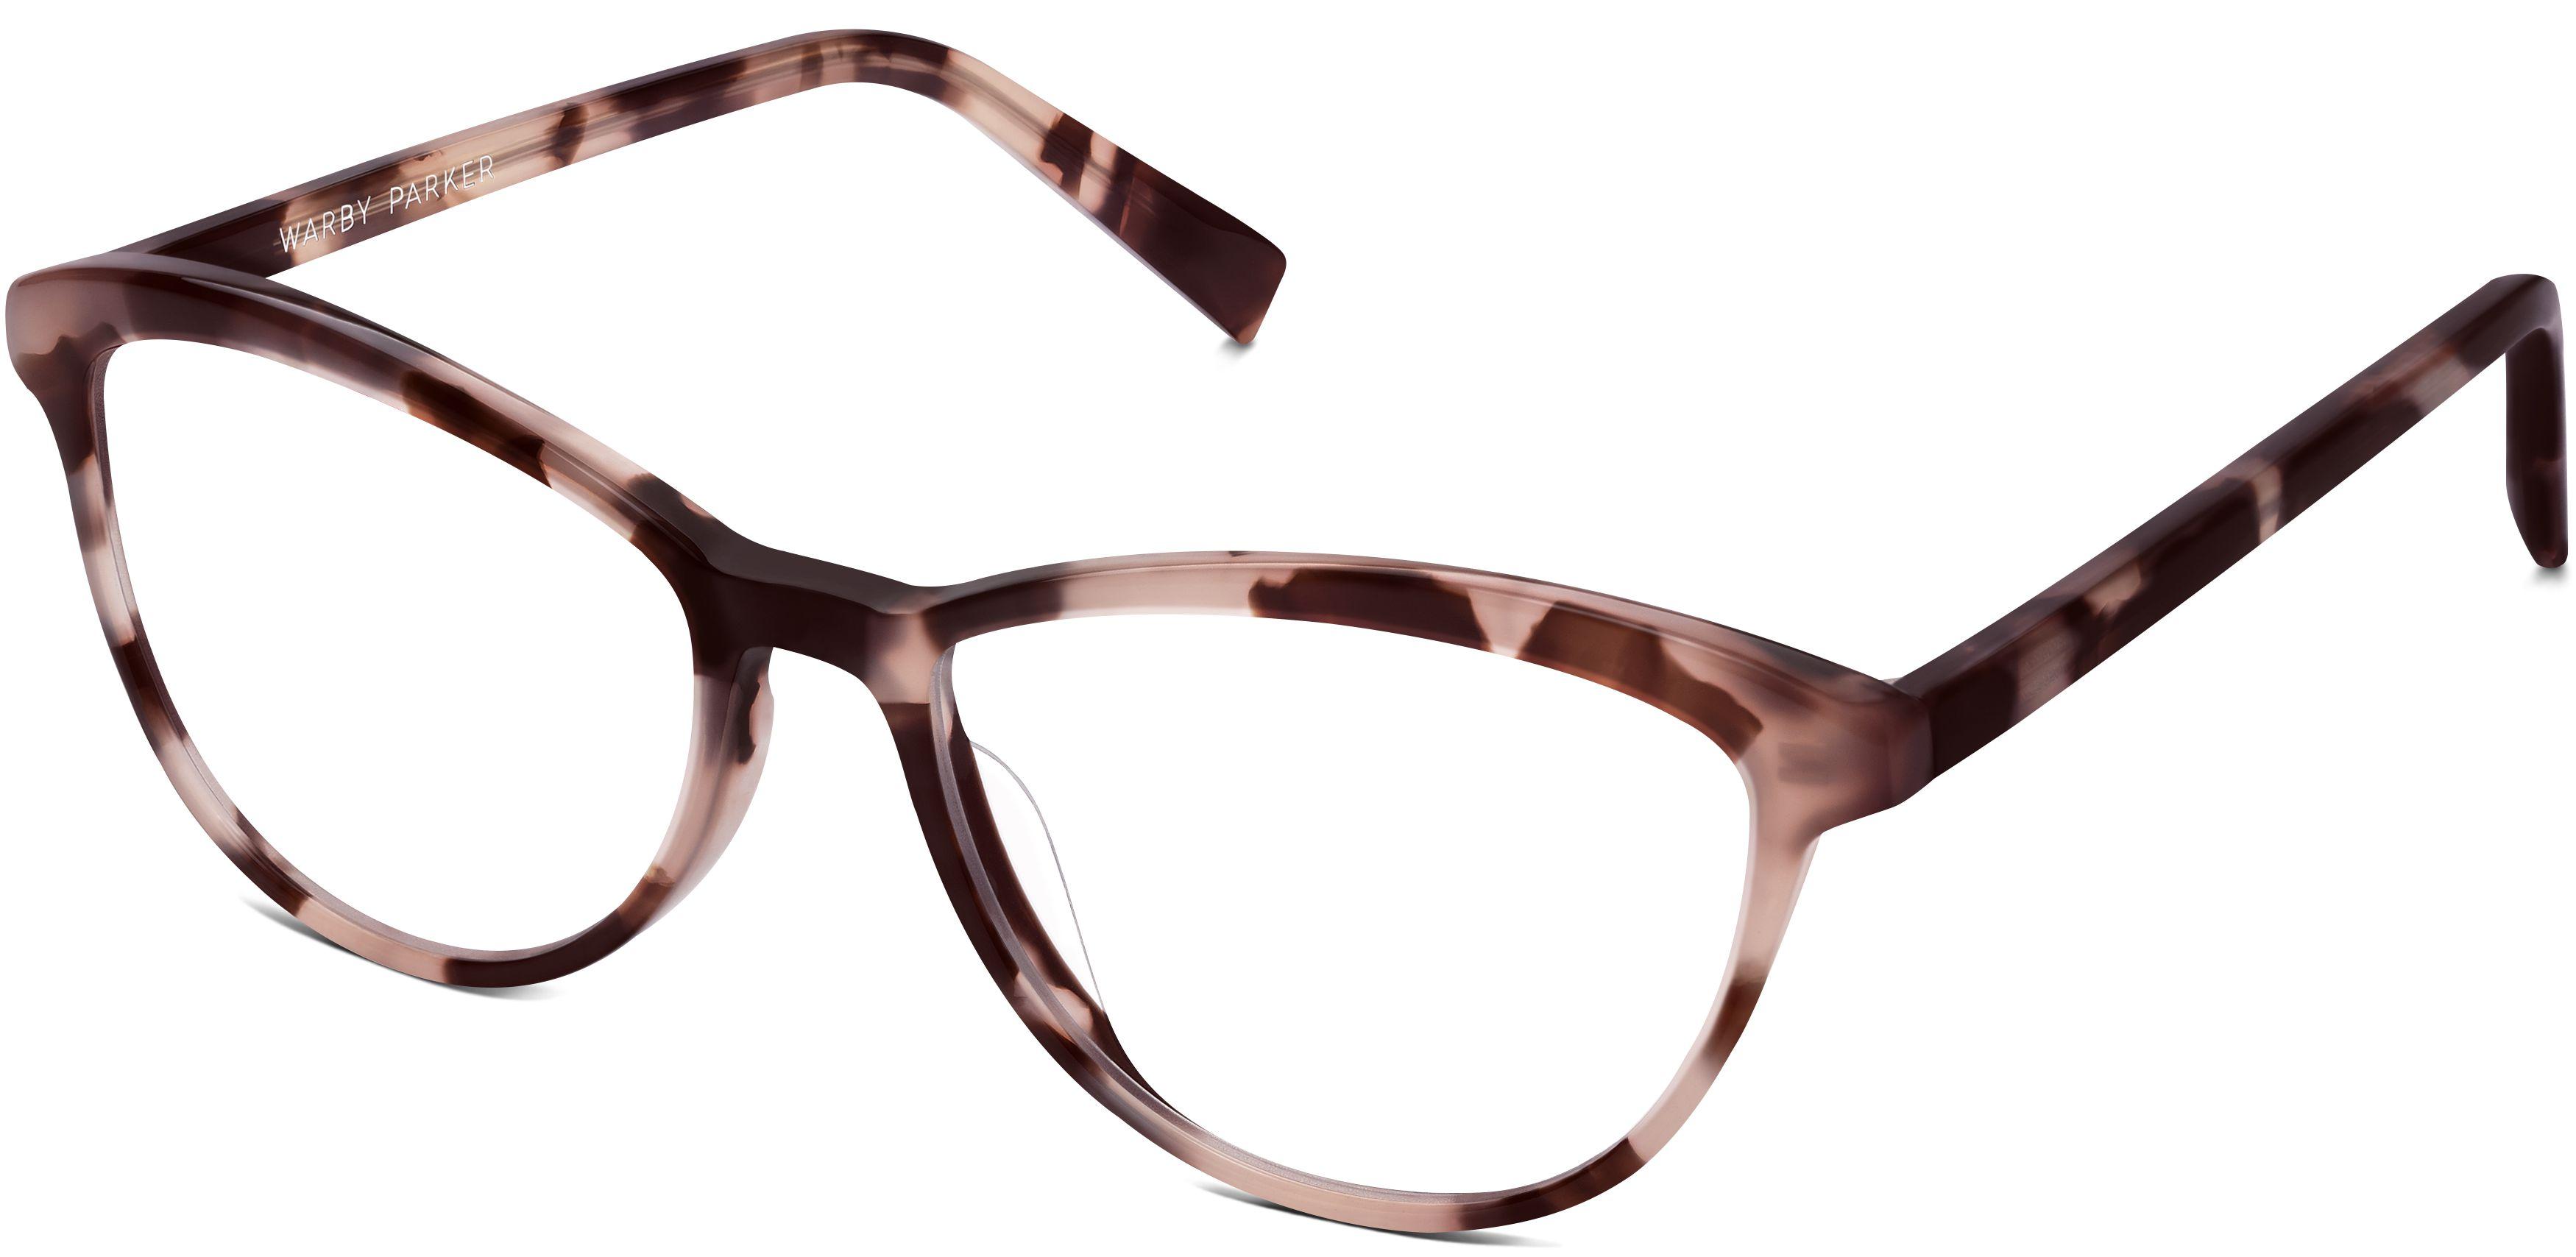 Warby Parker Louise blush tortoise eye glasses #bestglasses #WarbyParker